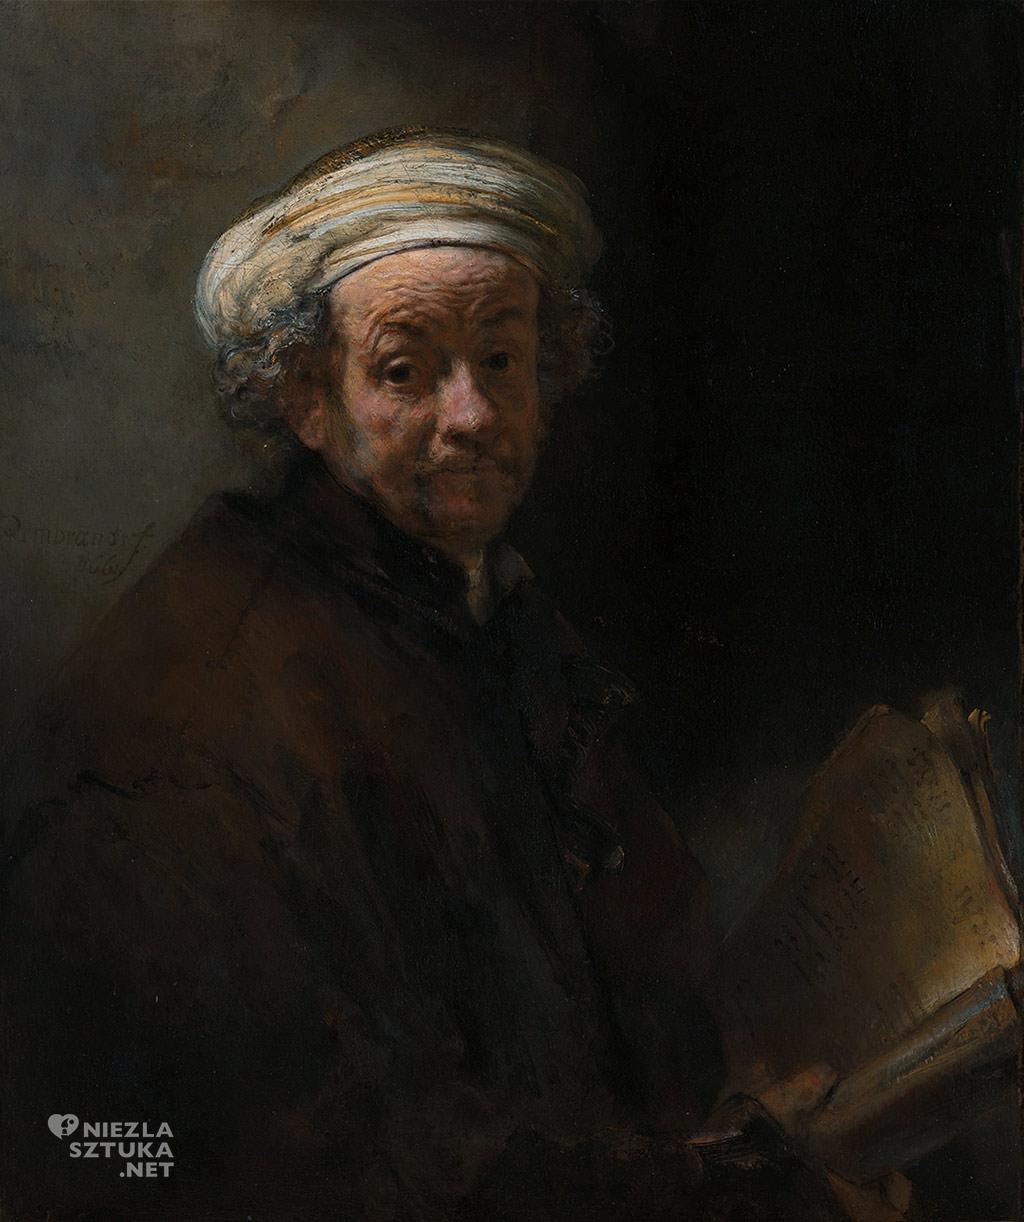 Rembrandt Autoportret jako św Paweł, Rijksmuseum